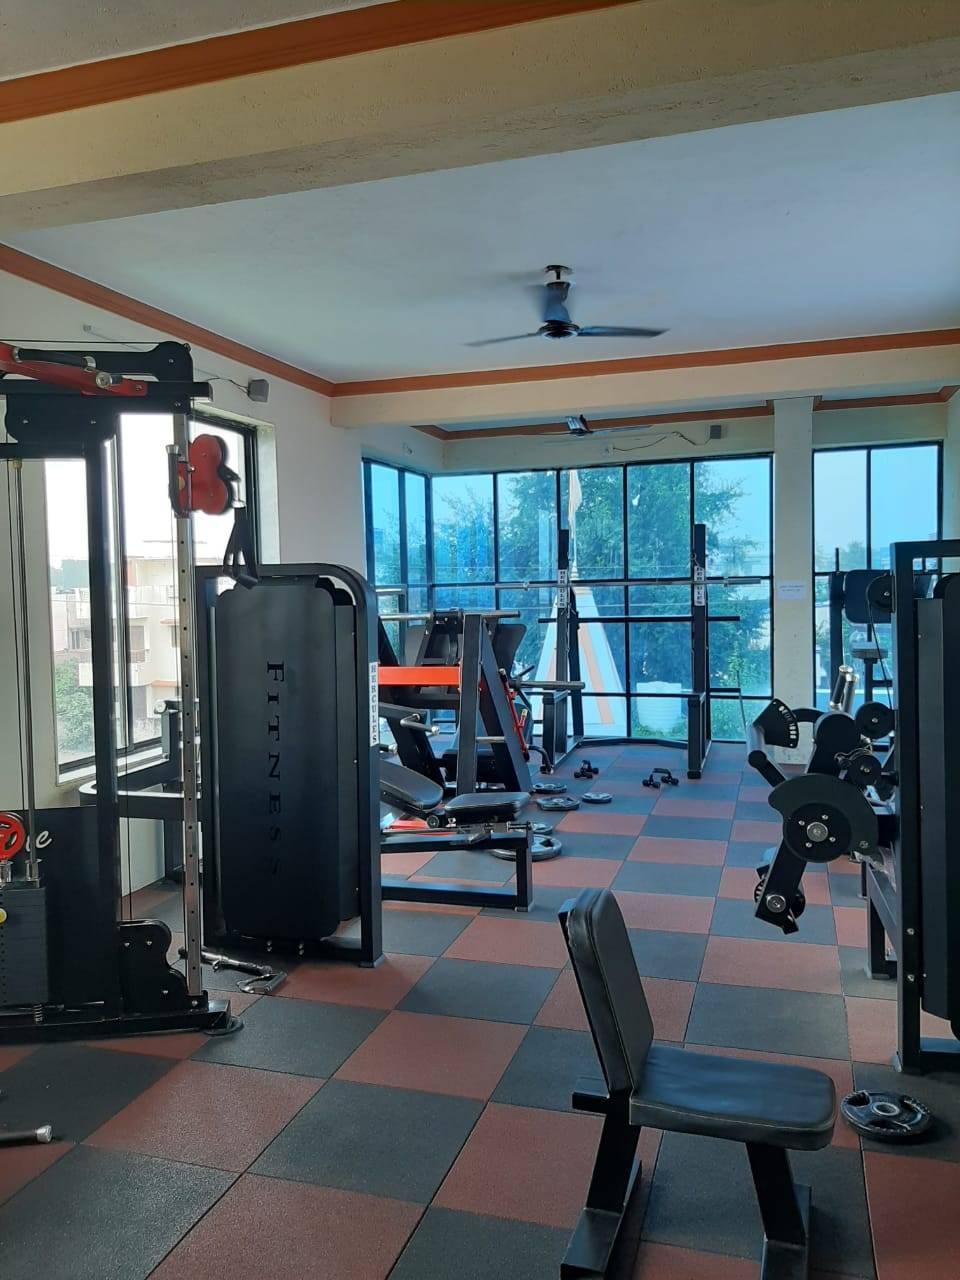 Valsad-Garib-Nawaz-Society-DFC-Decent-Fitness-Centre_384_Mzg0_MTIxNQ